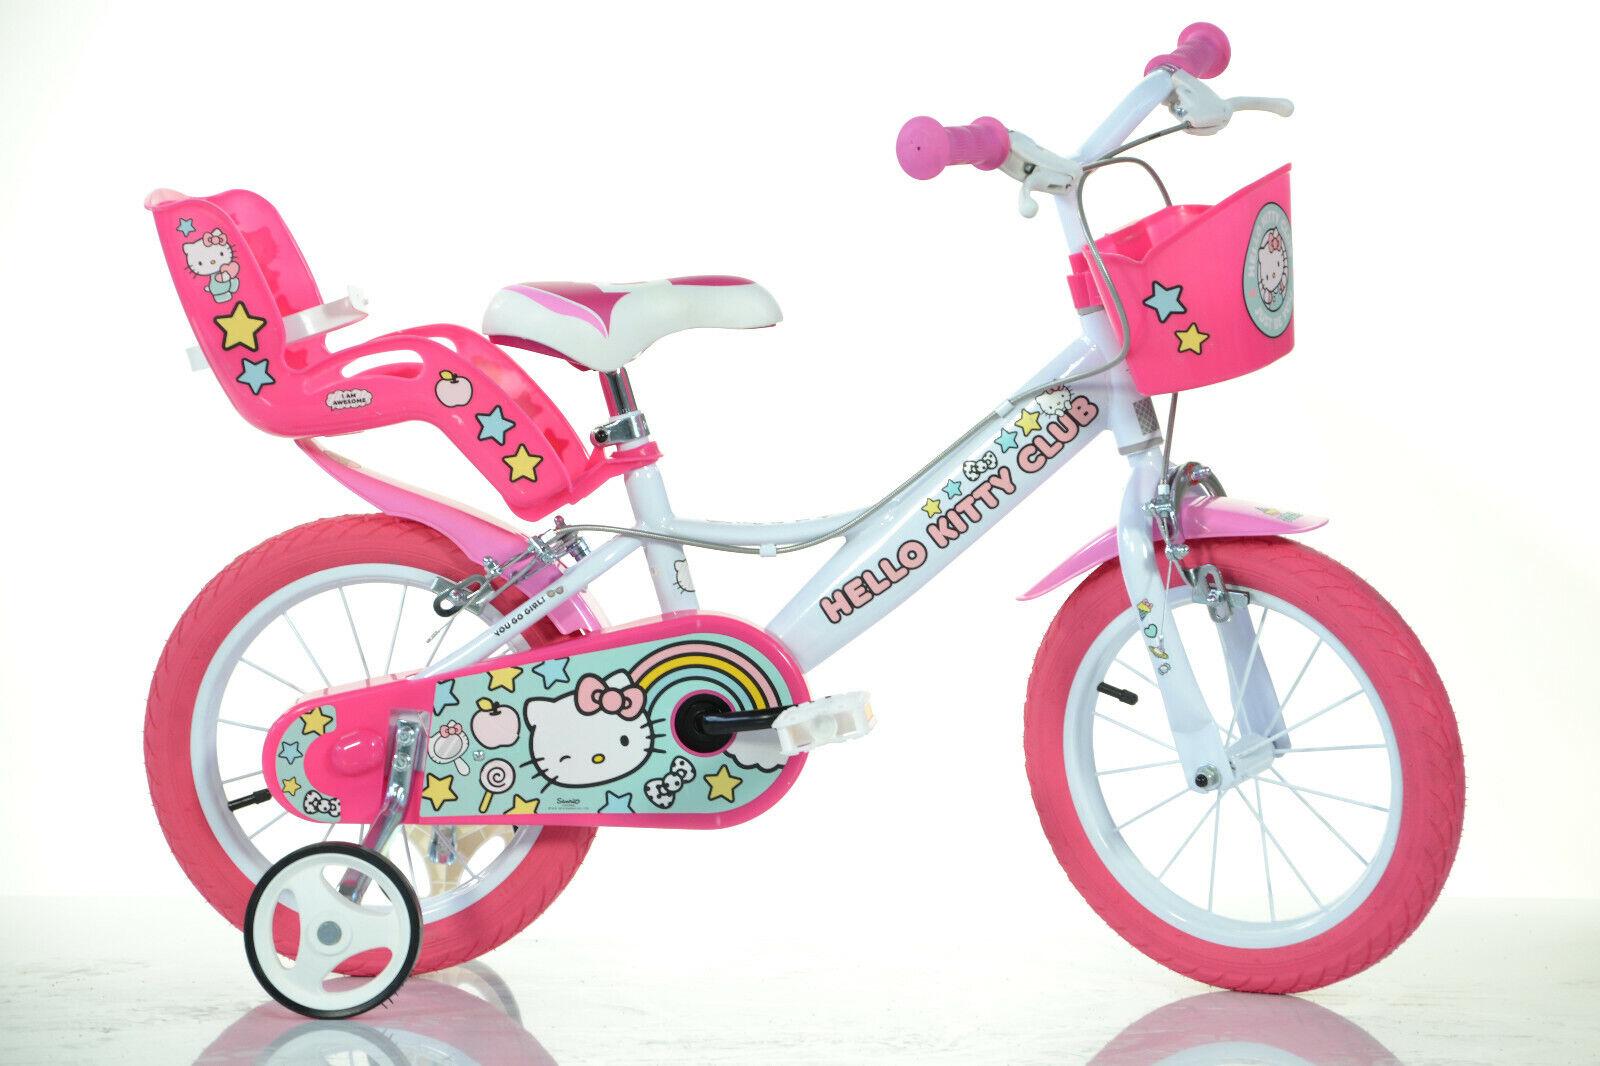 14 Zoll Kinderfahrrad Hello Kitty Original Lizenz Kinderrad Fahrrad Spielrad